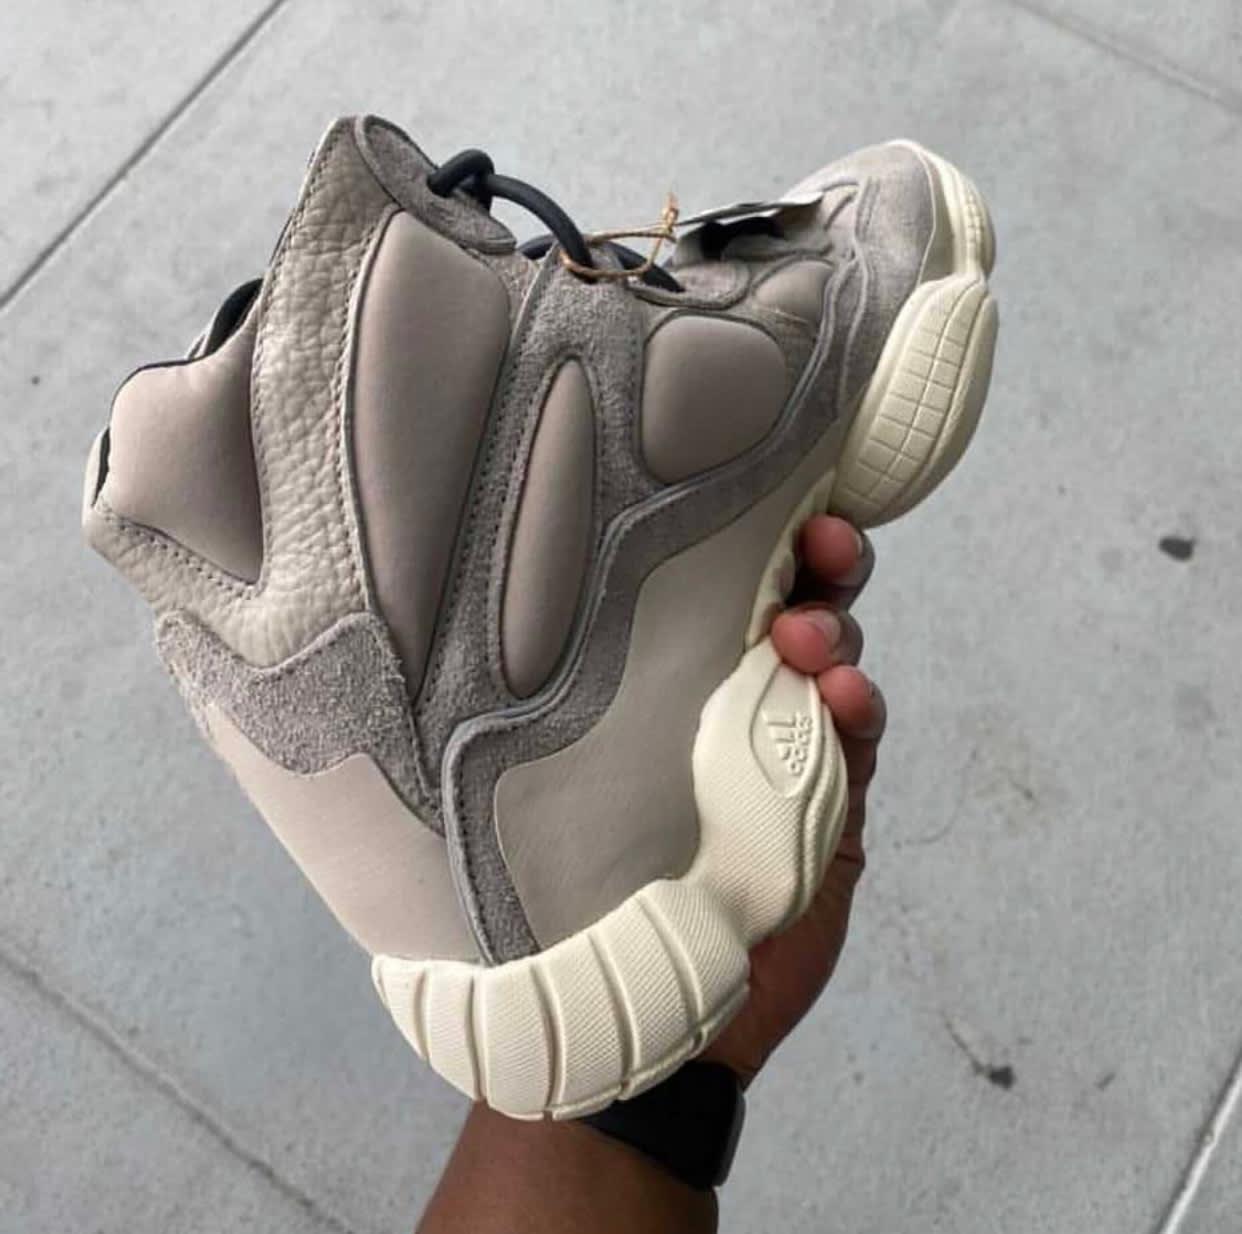 Adidas Yeezy 500 High Mist Stone Medial